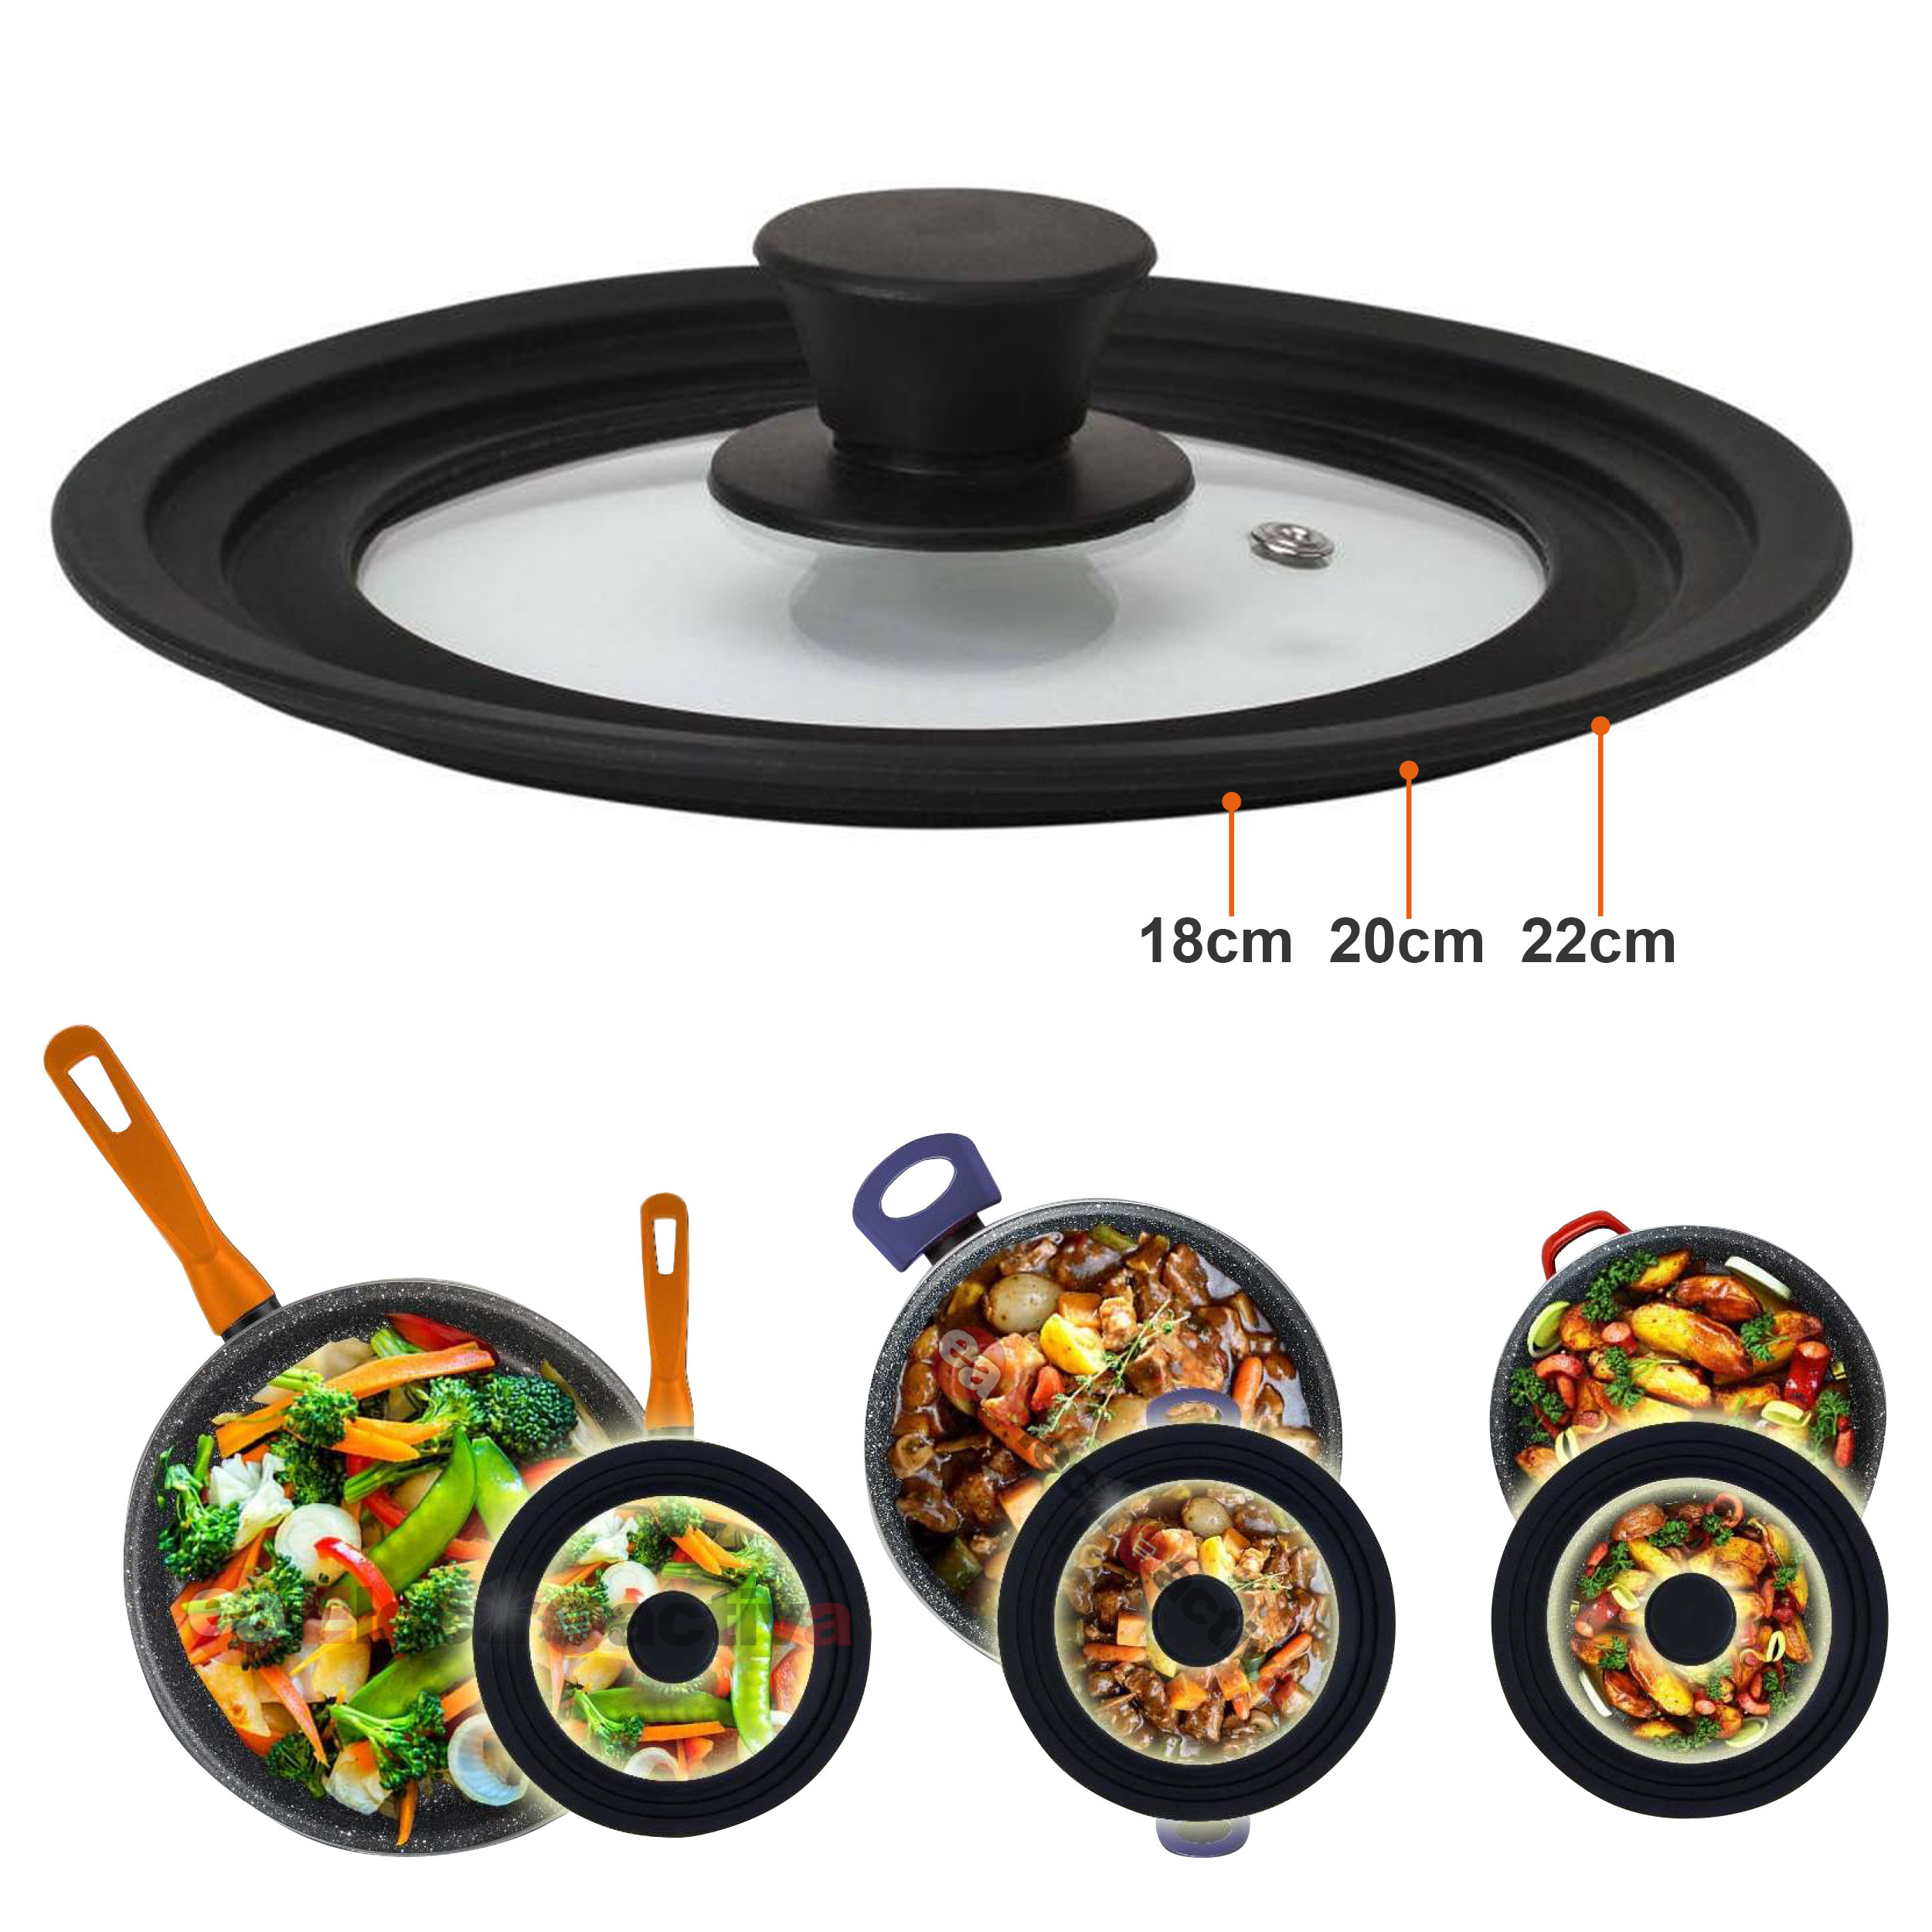 Magefesa - Tapa de sartén, ollas, cacerolas multidiámetro universal adaptable con borde de silicona y cristal con válvula de vapor para diámetro de 18-20-22